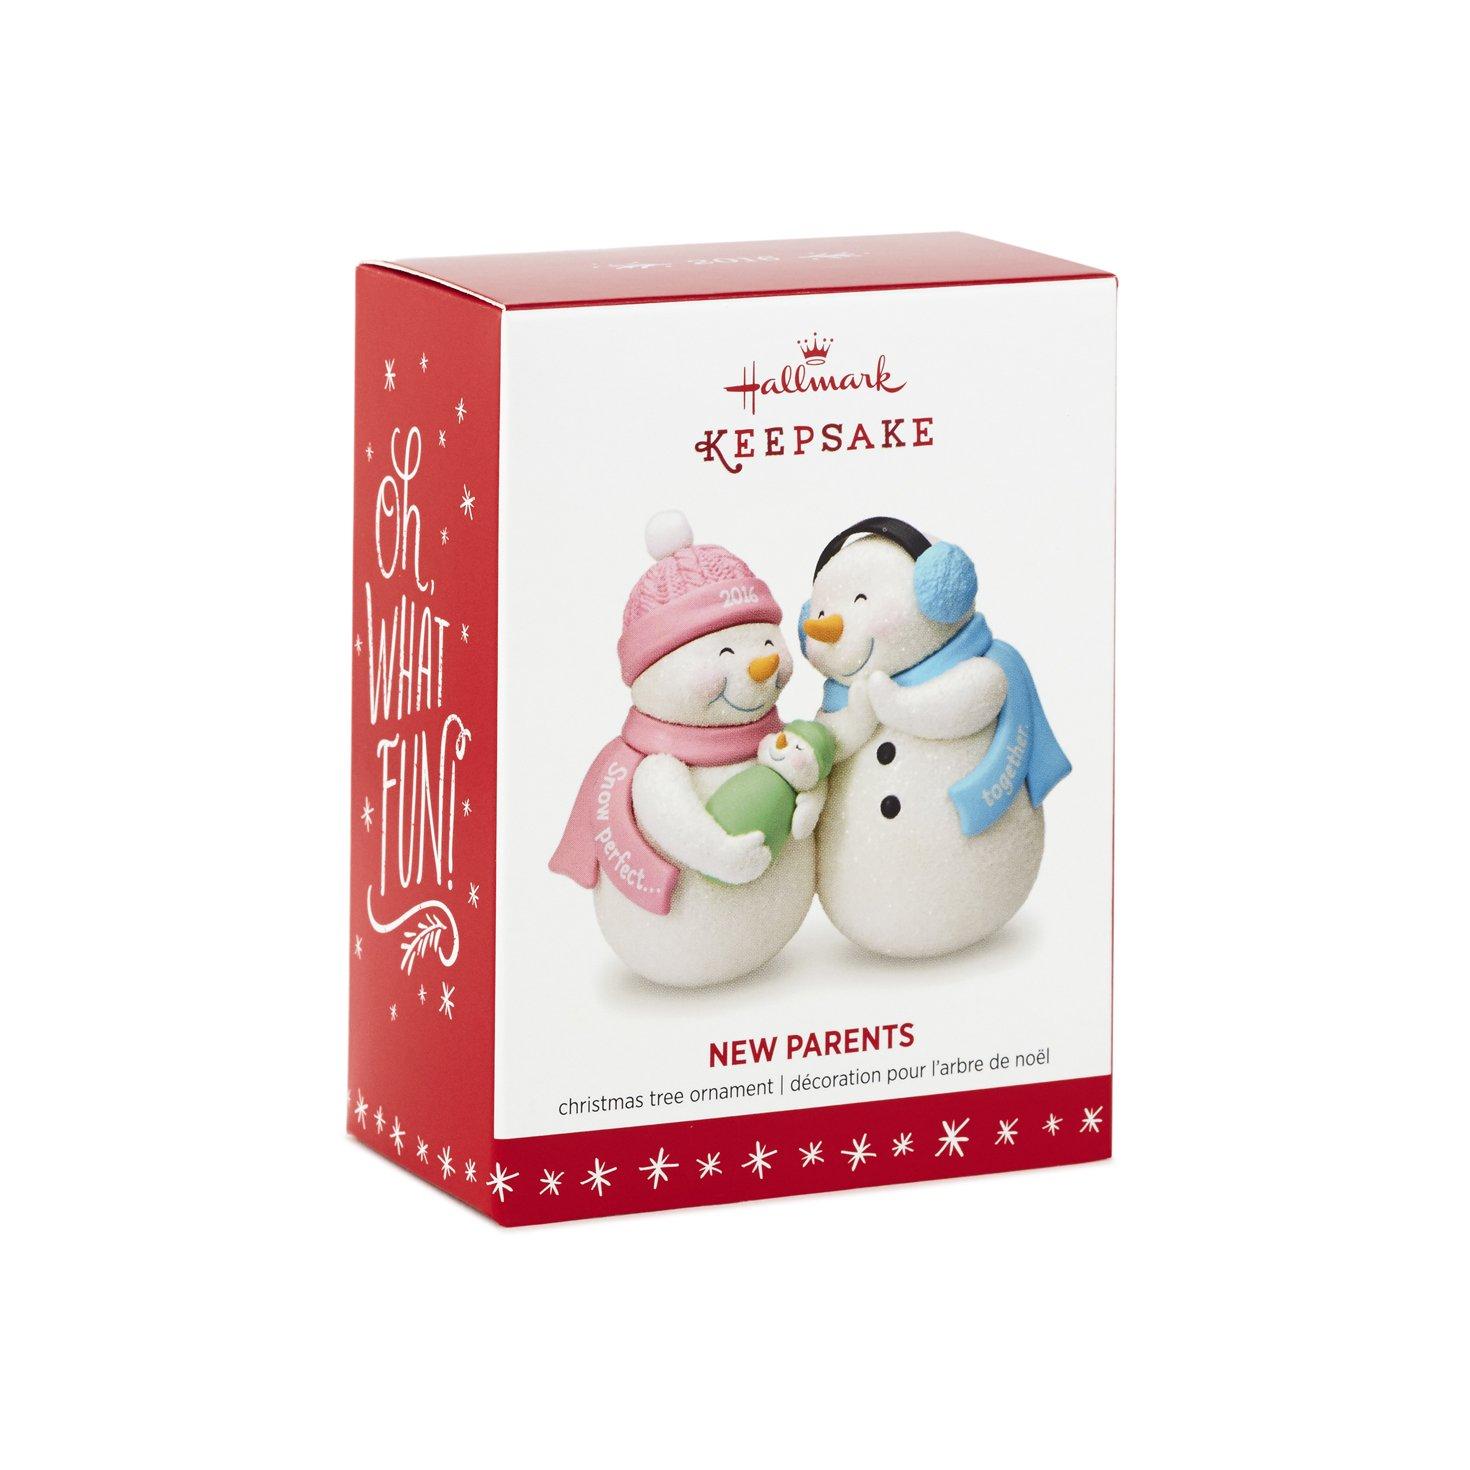 Amazon: New Parents Christmas Ornament Dated 2016 Hallmark Keepsake  Ornament: Home & Kitchen